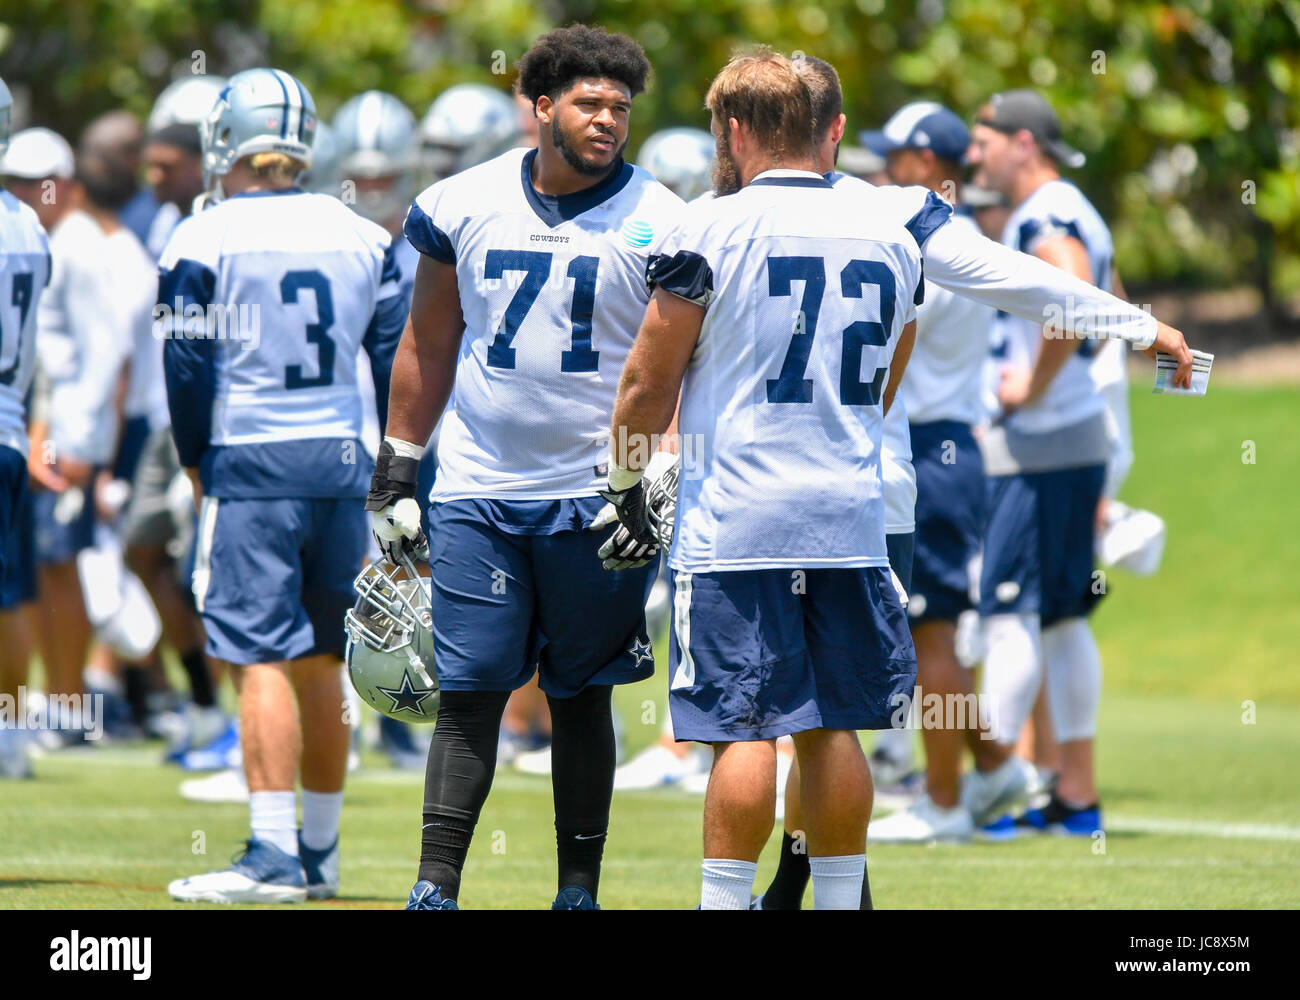 June 14, 2017: Dallas Cowboys offensive guard La'el Collins #71 during an NFL mini-camp organized team activities Stock Photo